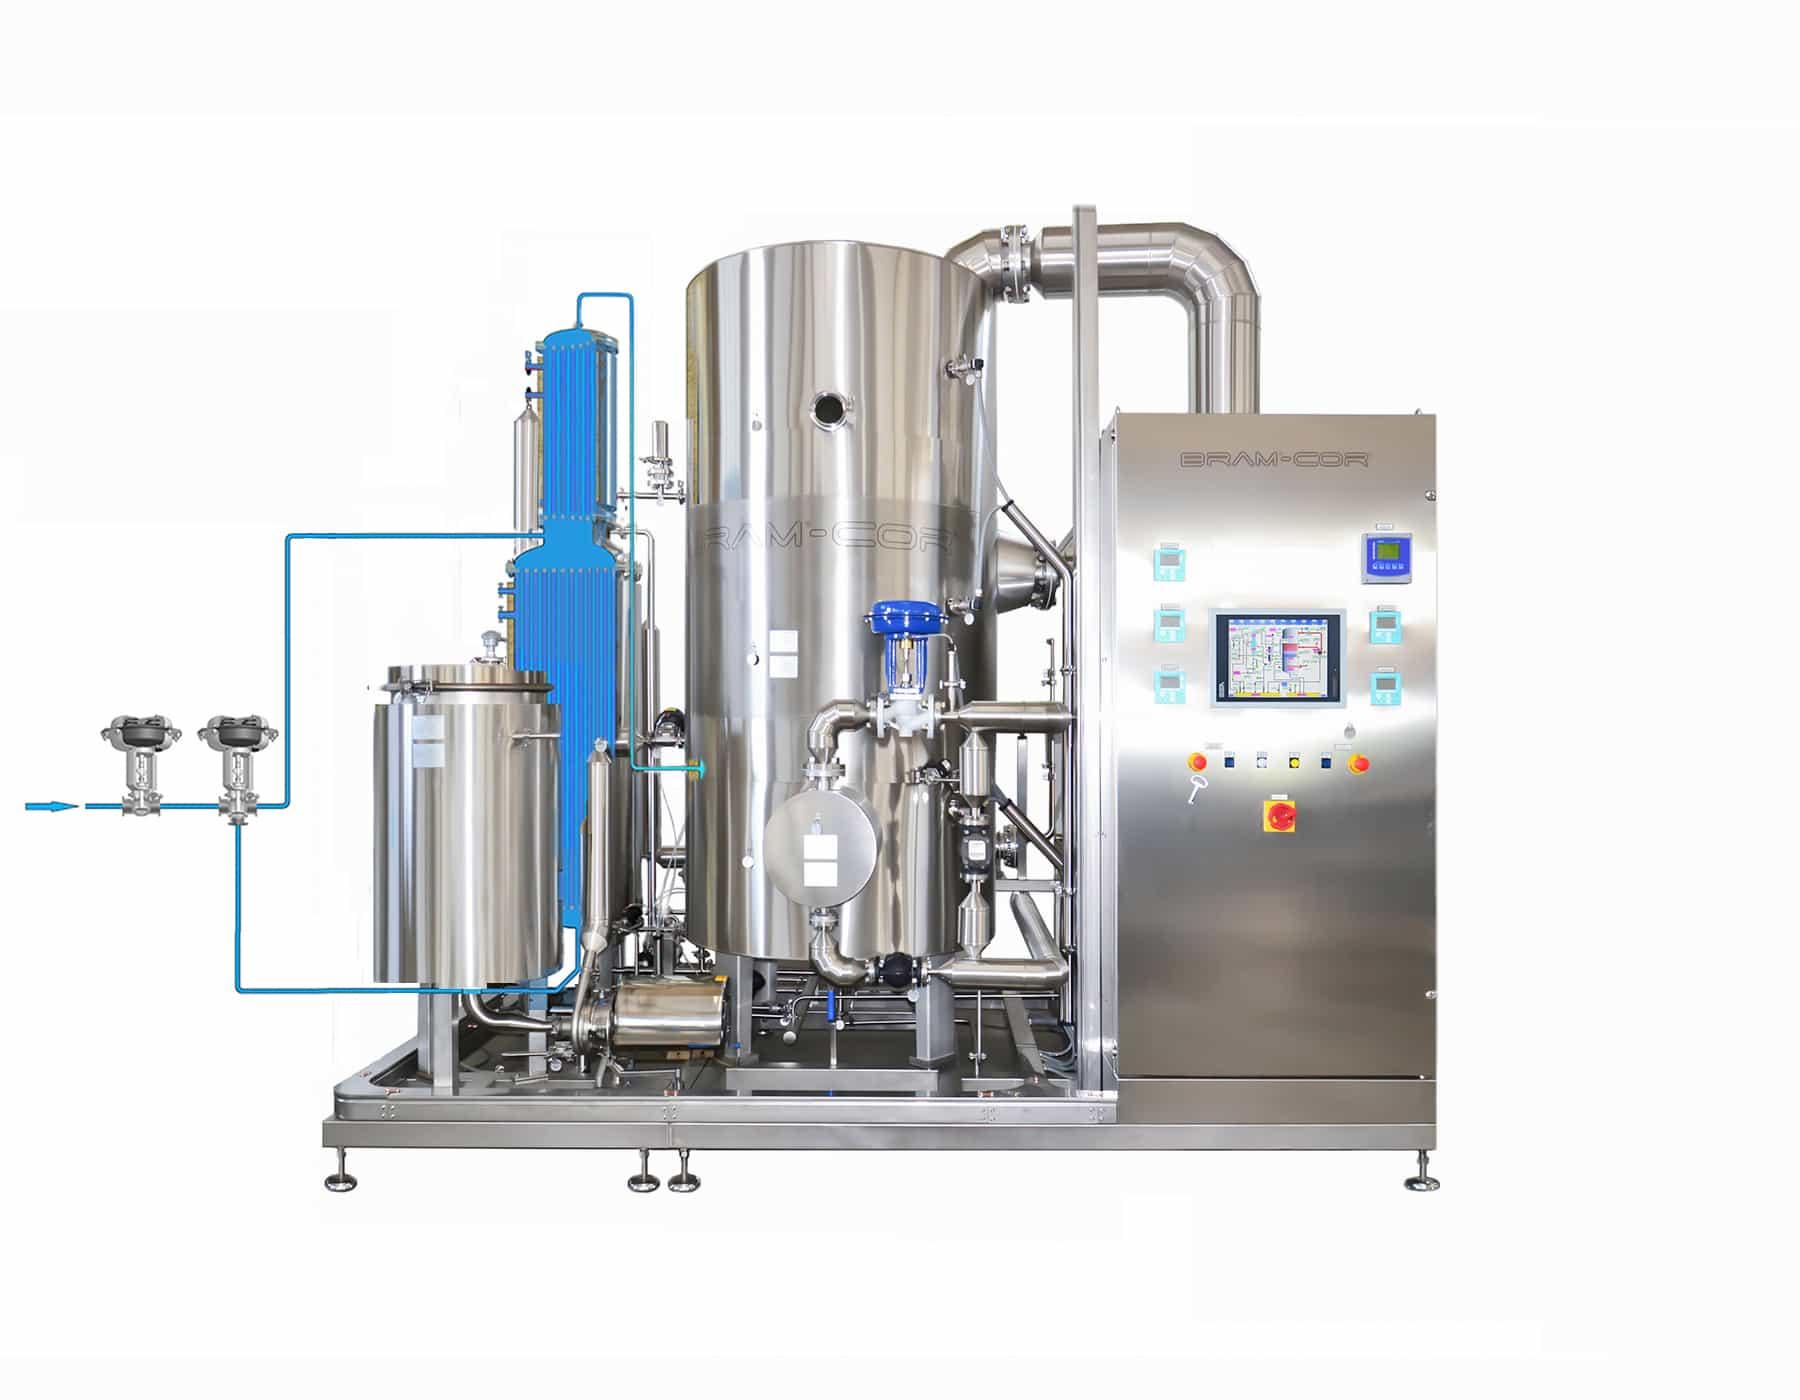 Vapor Compression Distillation process - Step 1-2